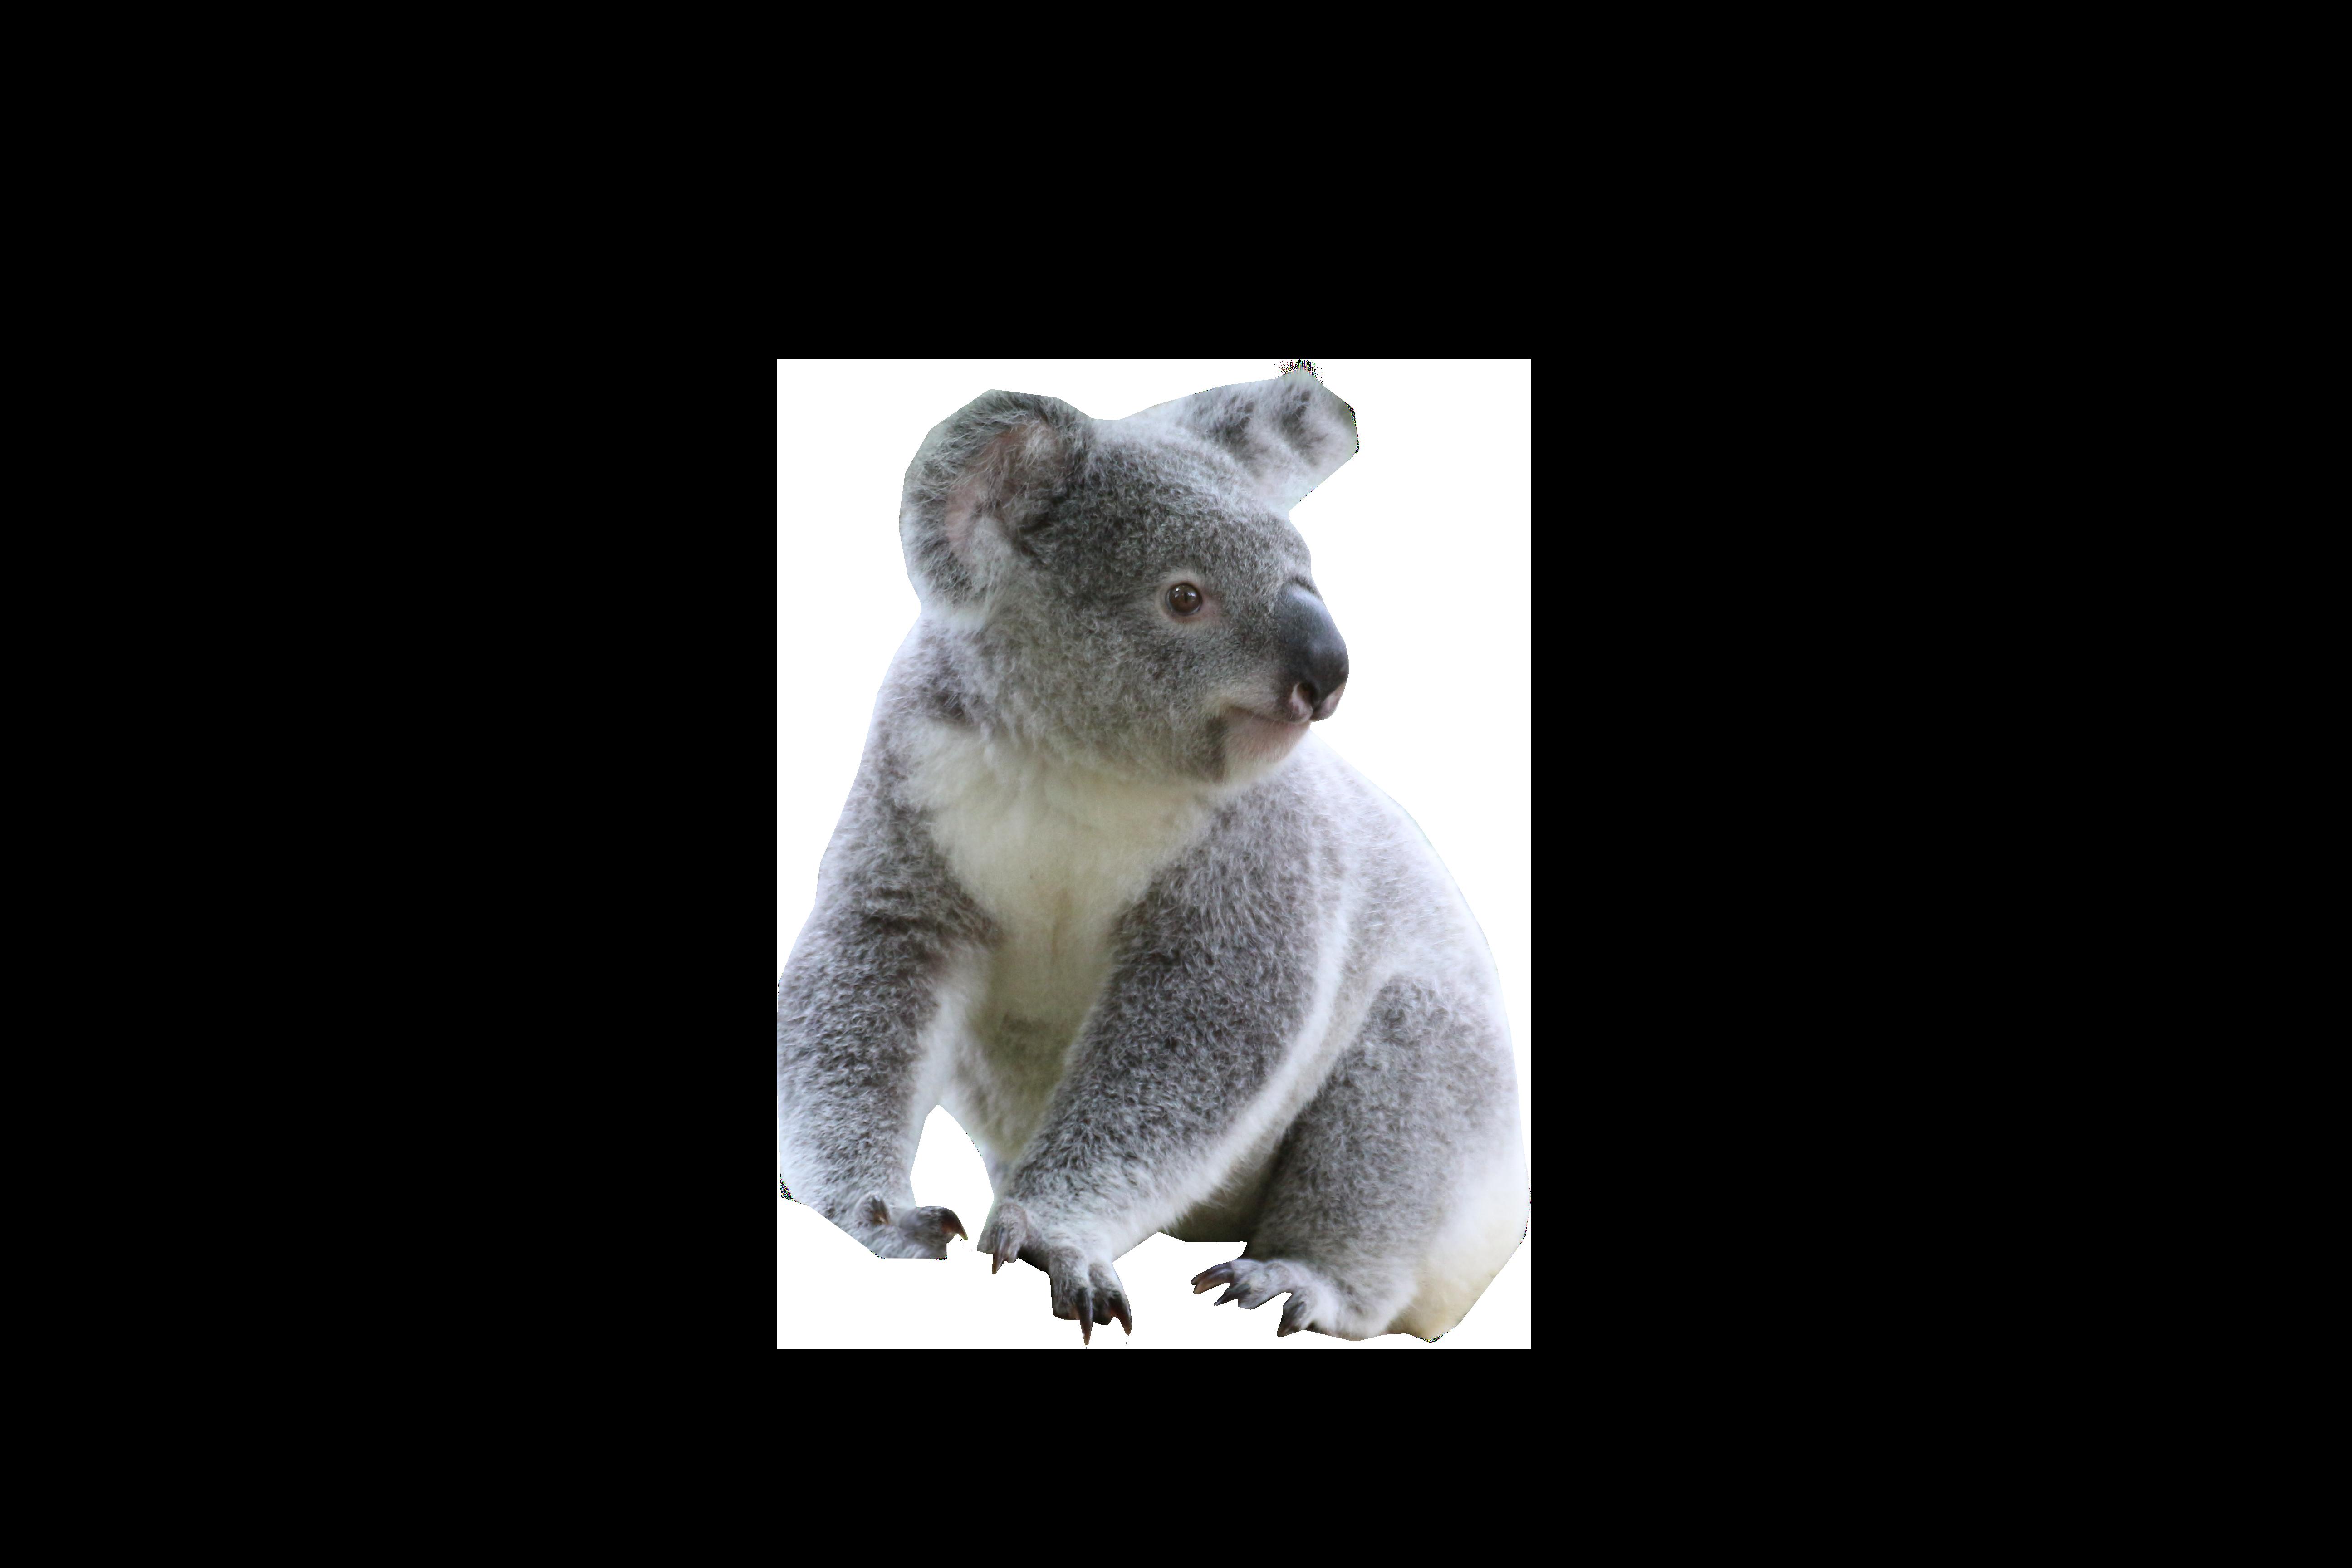 Cute Koala PNG Image.